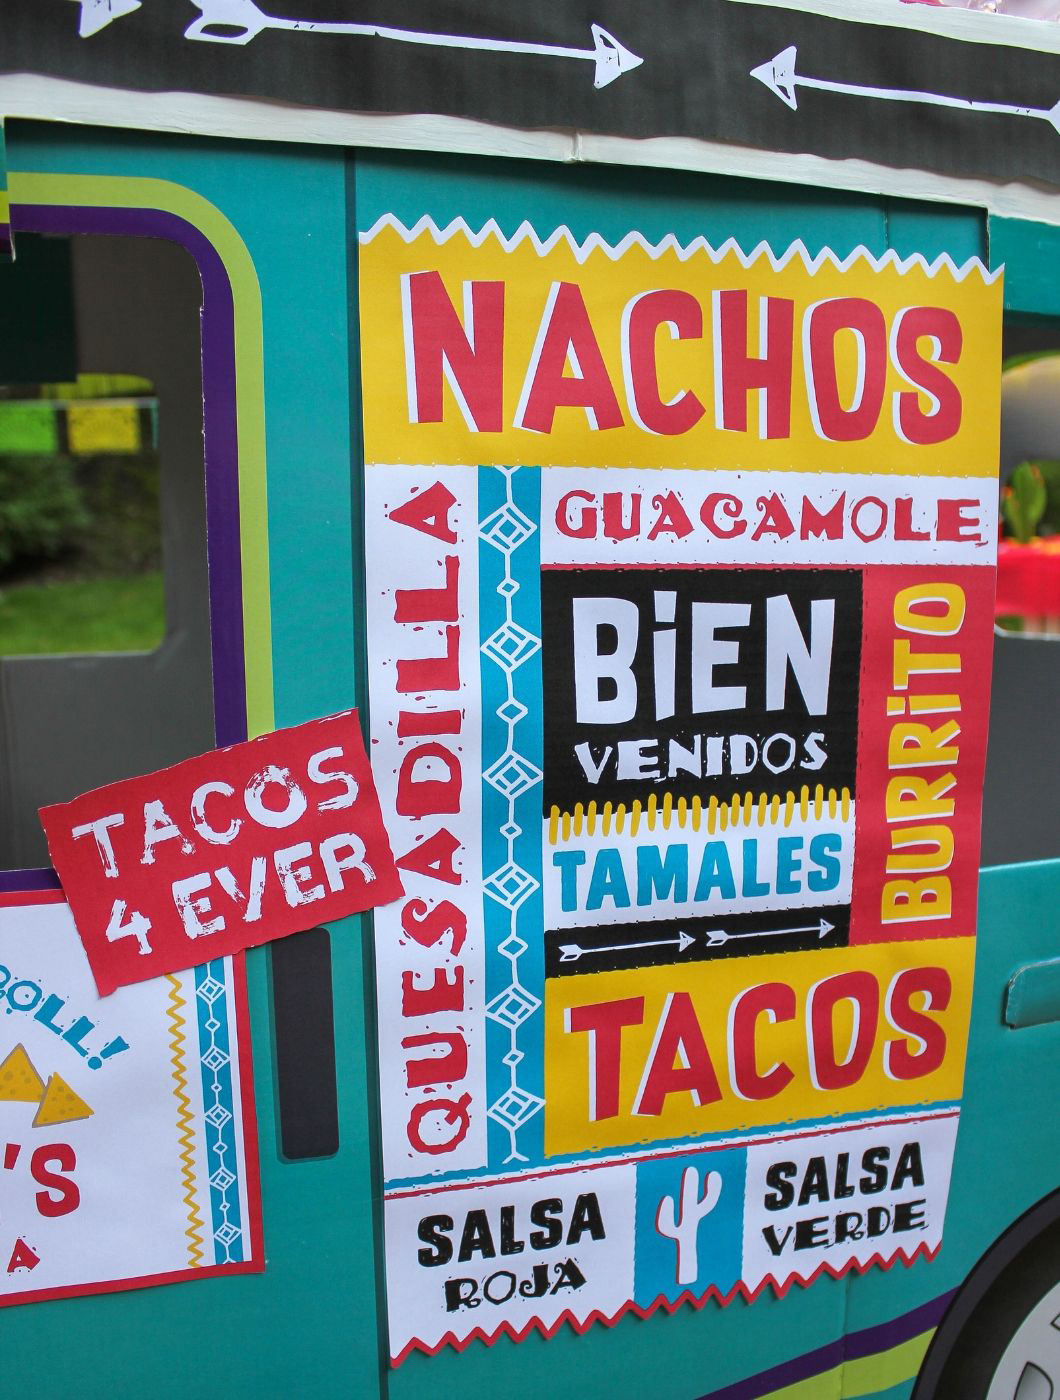 taco truck, taco truck party, taco, taco 'bout fun, oriental trading, Fun365, Just Add Confetti, fiesta, taco truck fiesta, diy taco truck, kids party, party ideas, diy party ideas, free printables, party printables, taco truck birthday party, taco party